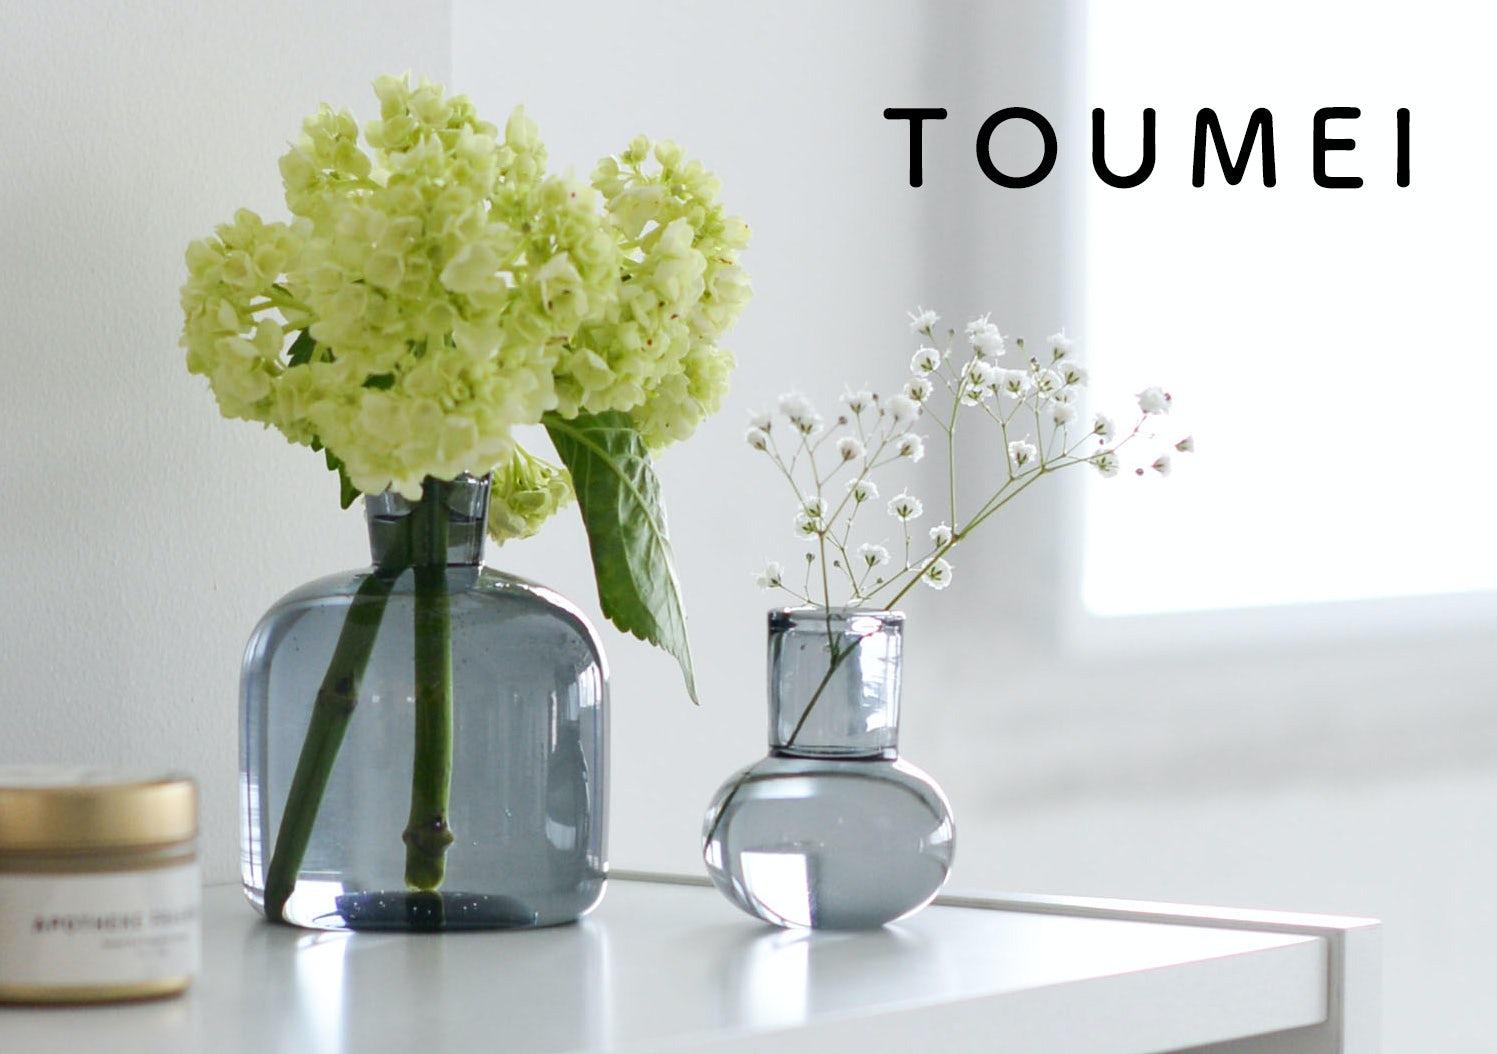 TOUMEI / フラワーベースの画像